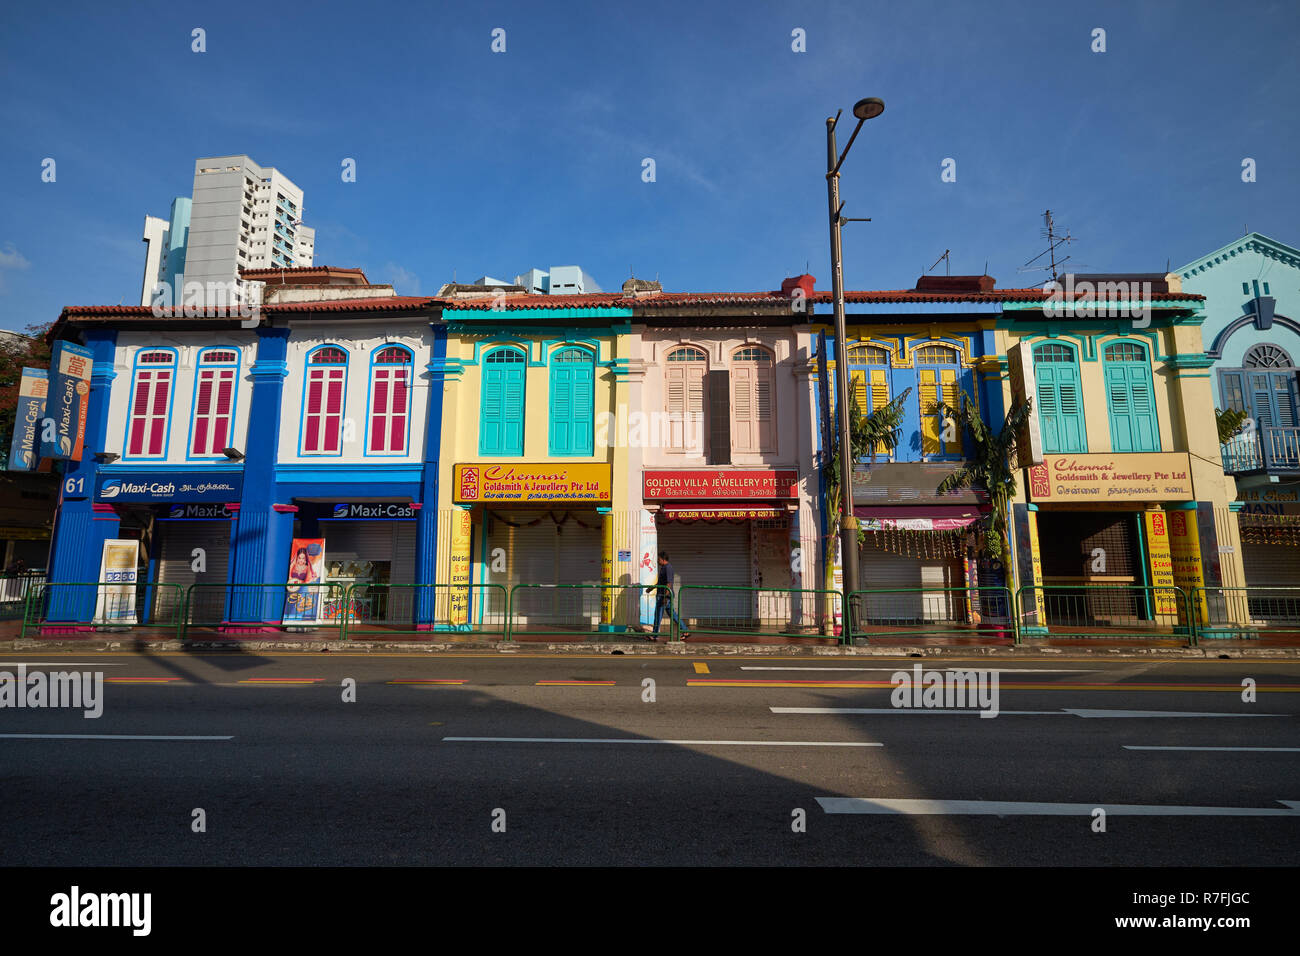 Renovated shophouses along Serangoon Road in Little India area, Singapore - Stock Image